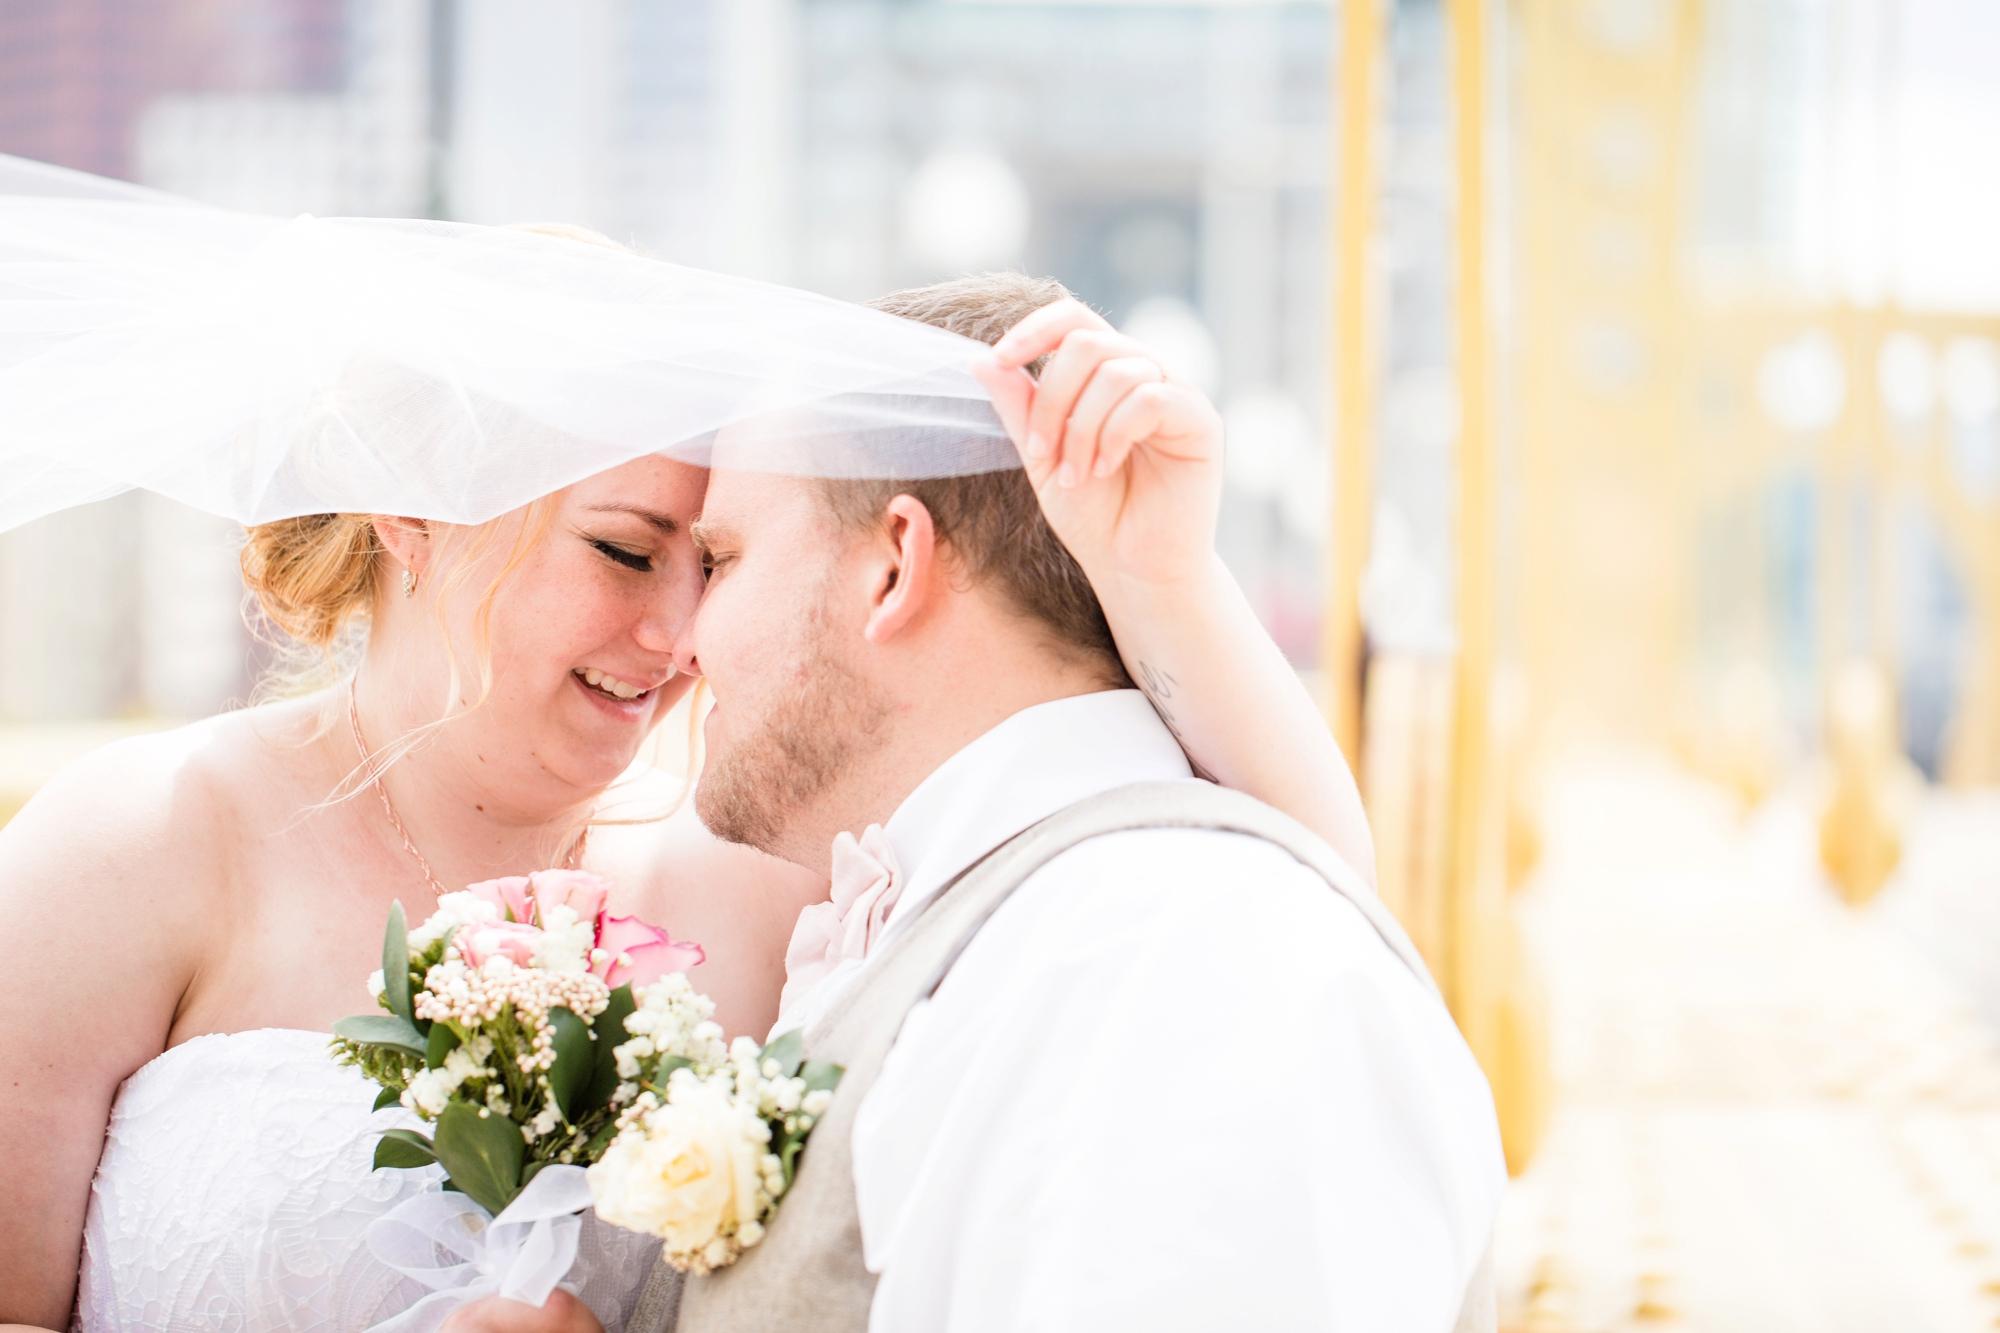 pittsburgh wedding photographer, pittsburgh wedding venues, pittsburgh wedding photos